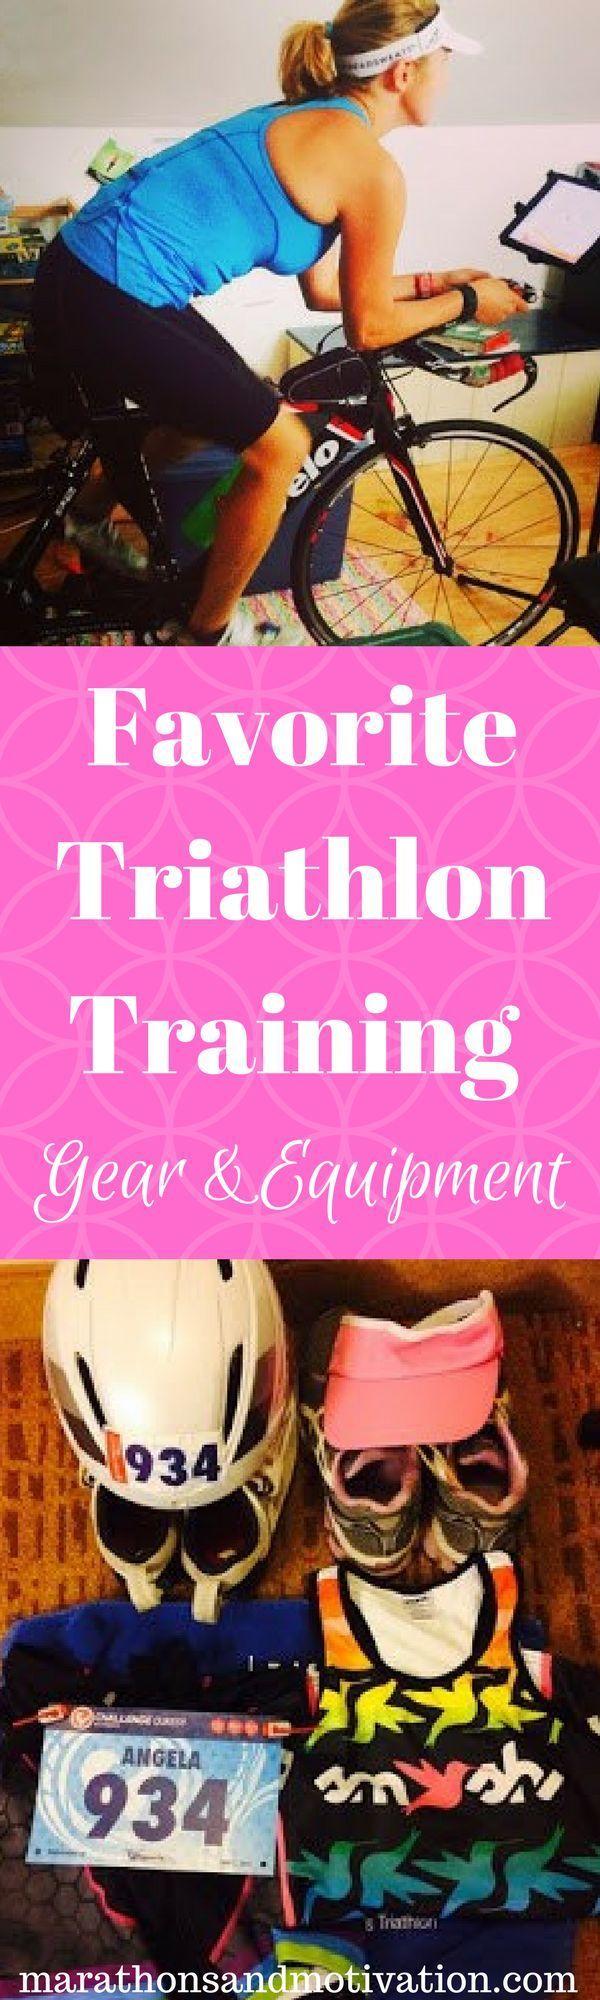 Triathlon Training Gear and Equipment: FAVORITE items for Sprint Triathlons   Ironman Triathlons   Swimming   Cycling   Running